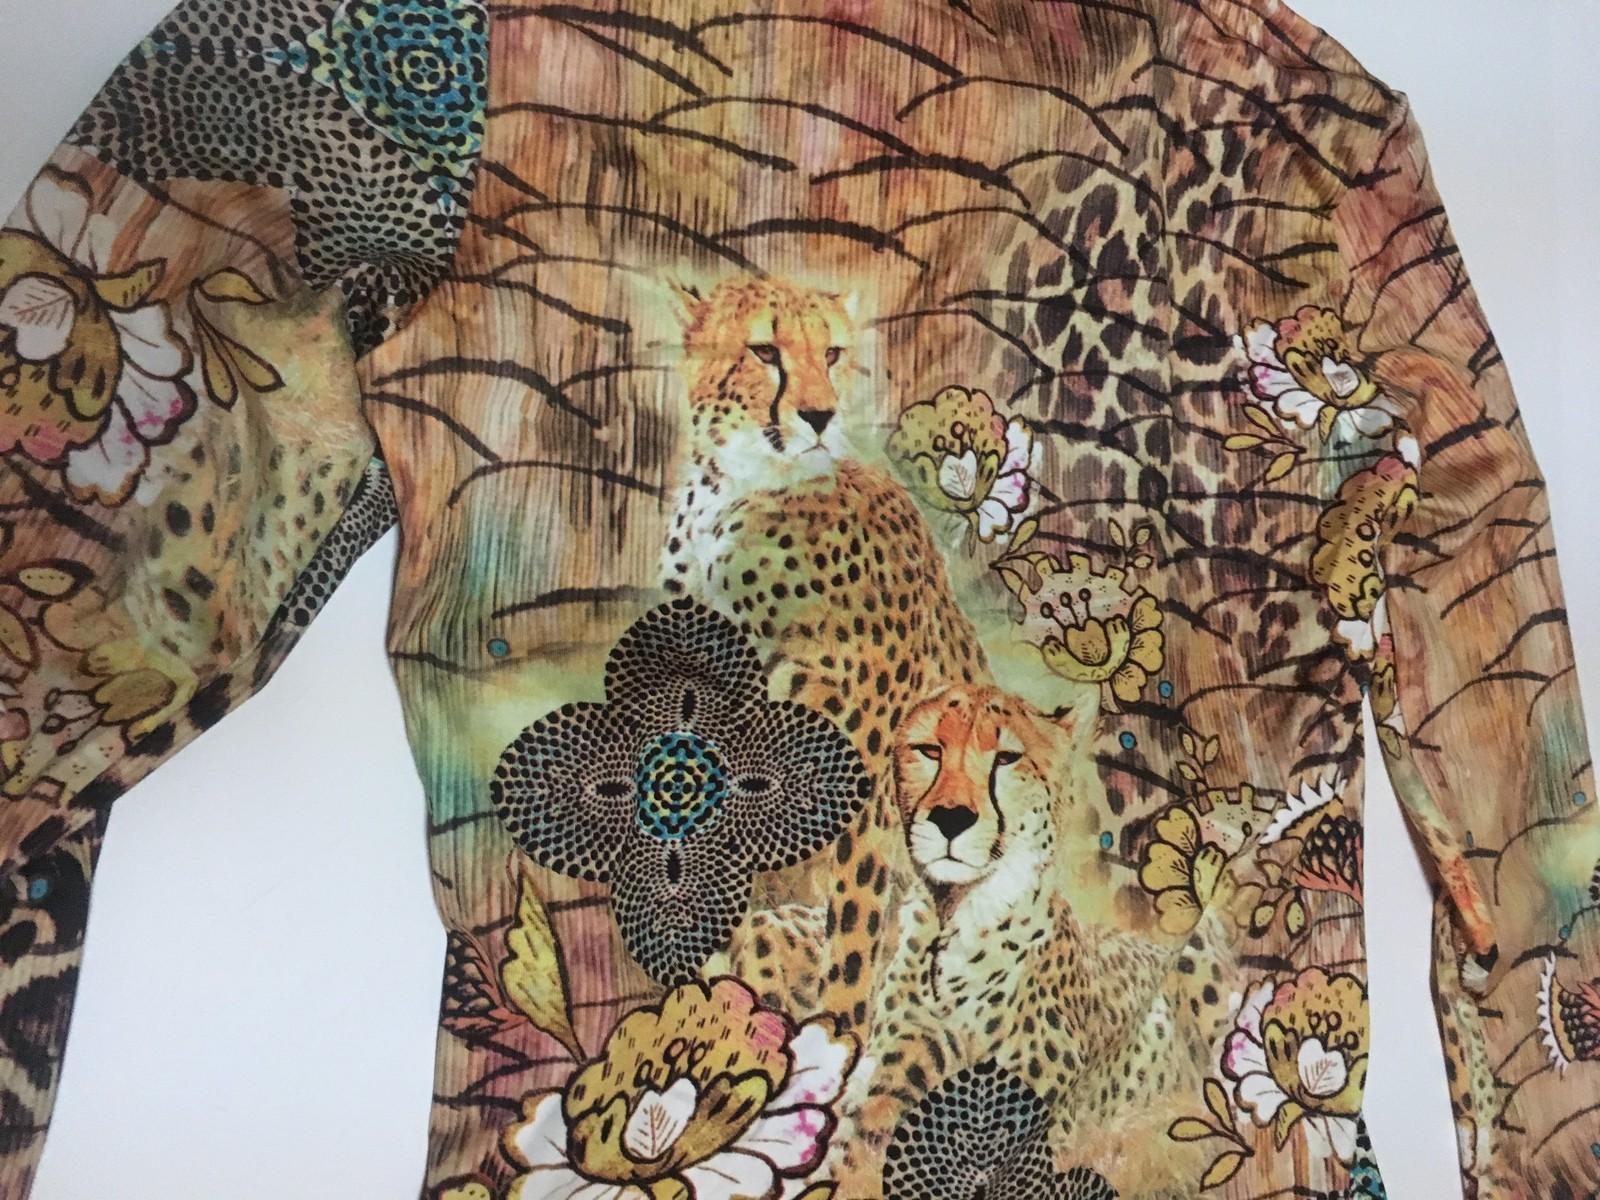 Boho Chic Animal Print Blouse Top NWT Sz M Made NY USA